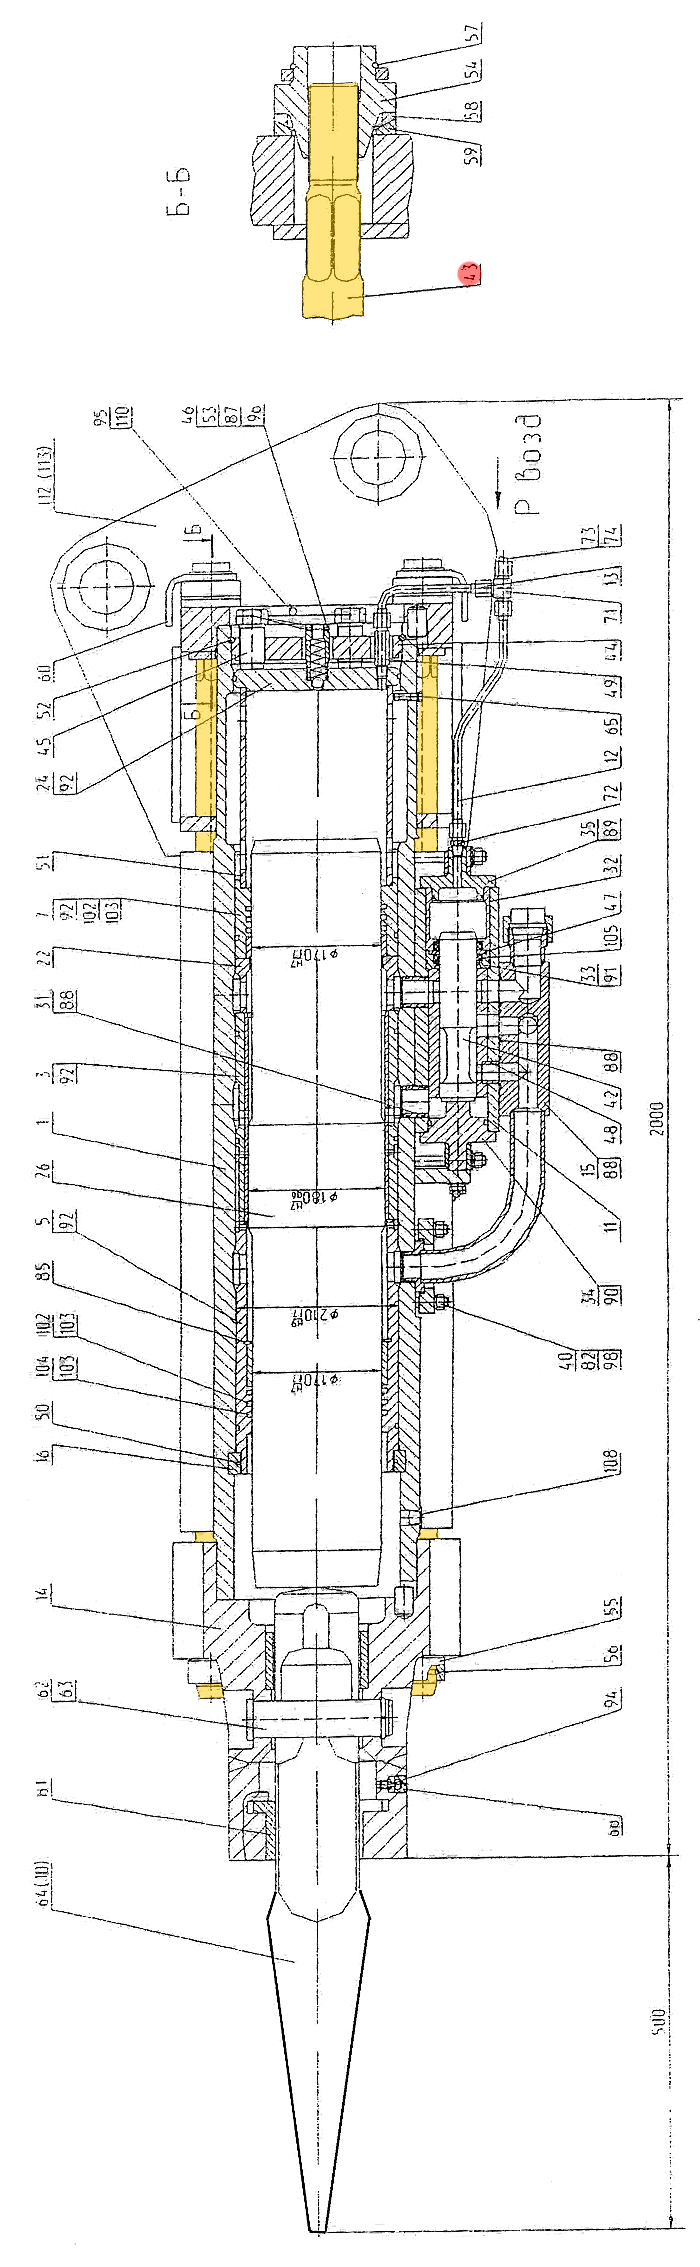 Стяжка МГ-300.033.1.038 гидромолота МГ-300